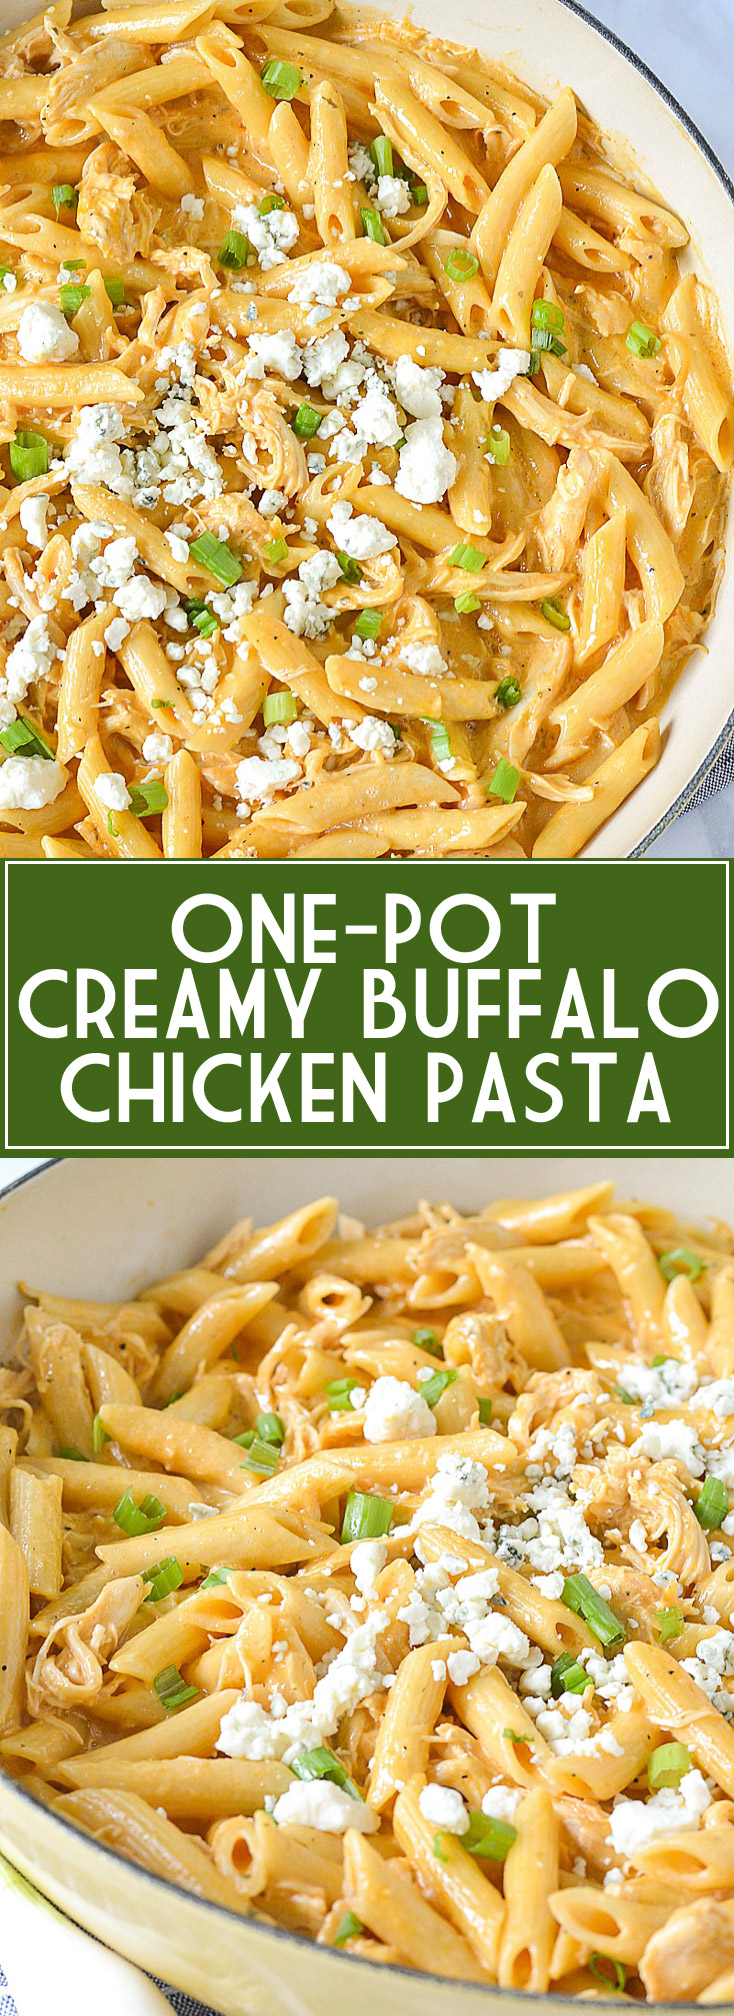 One-Pot Creamy Buffalo Chicken Pasta | www.motherthyme.com